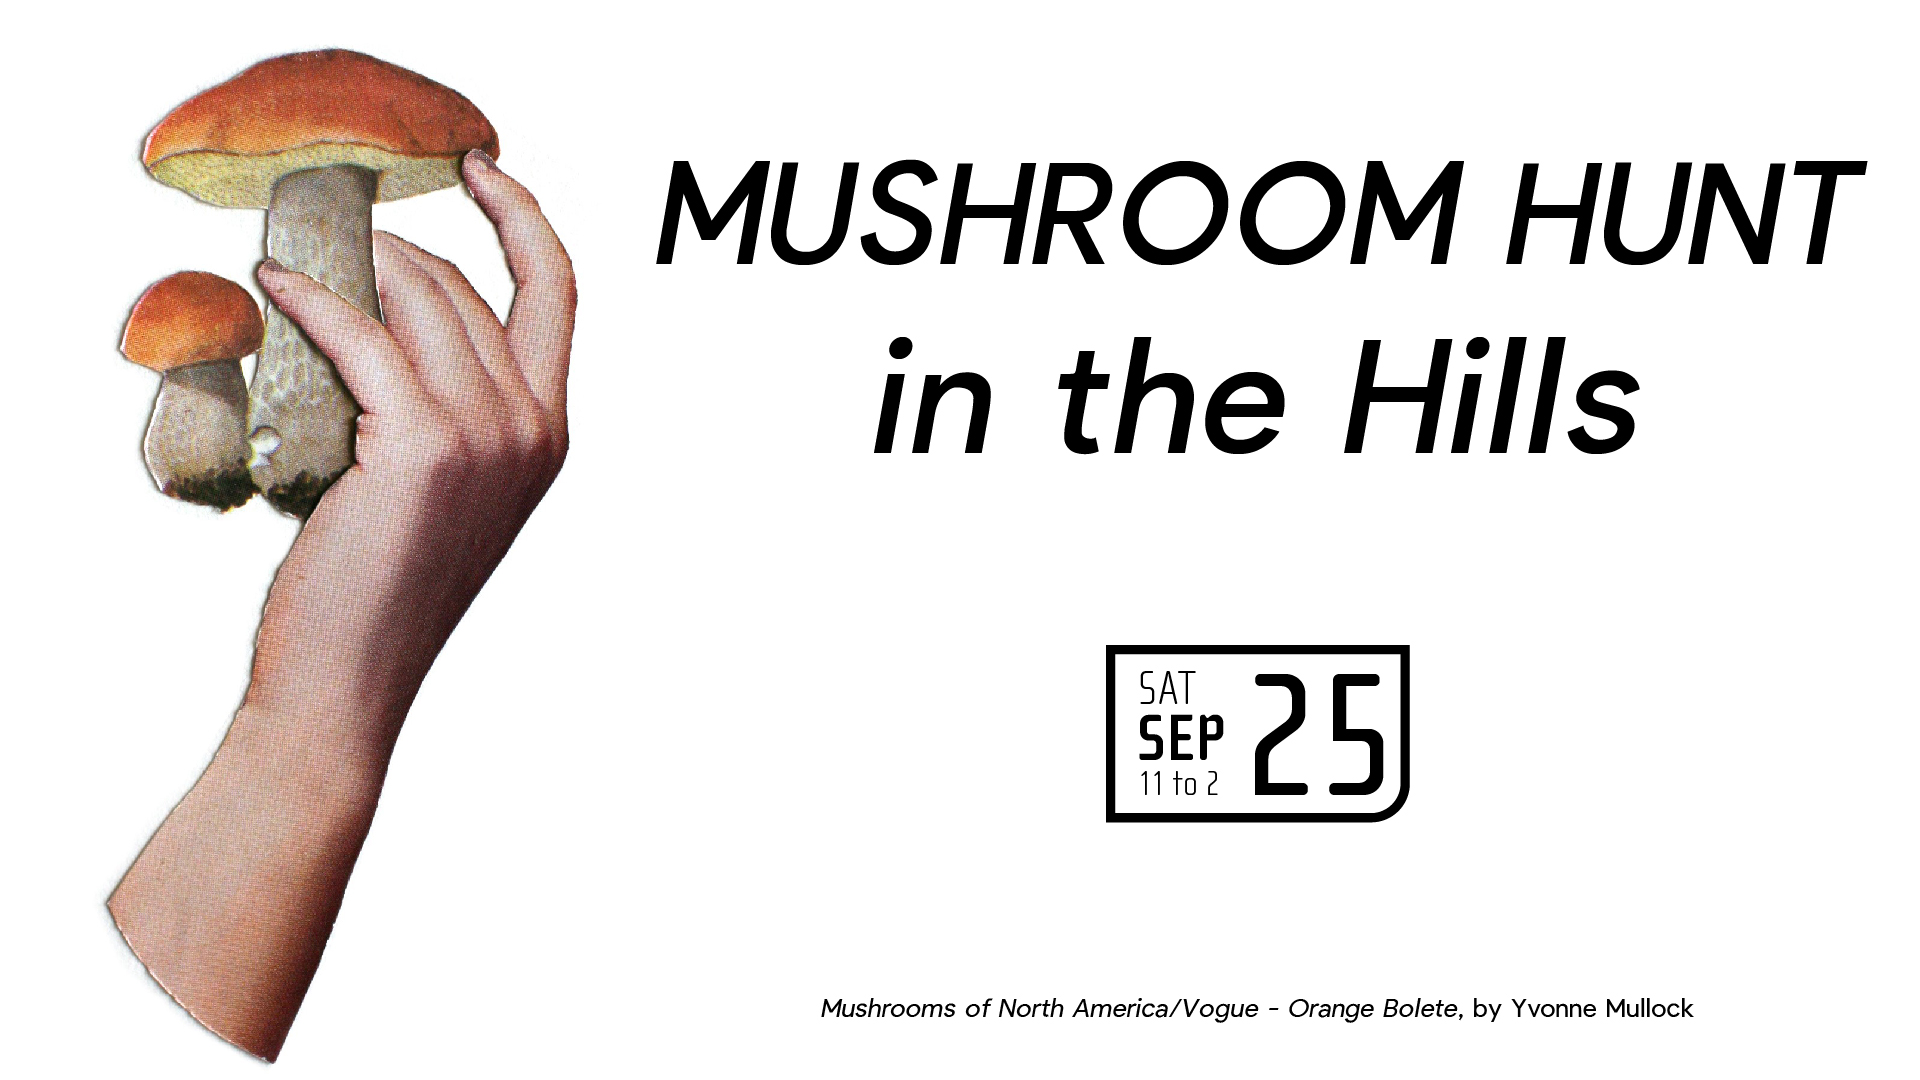 Mushroom Hunt in the Hills